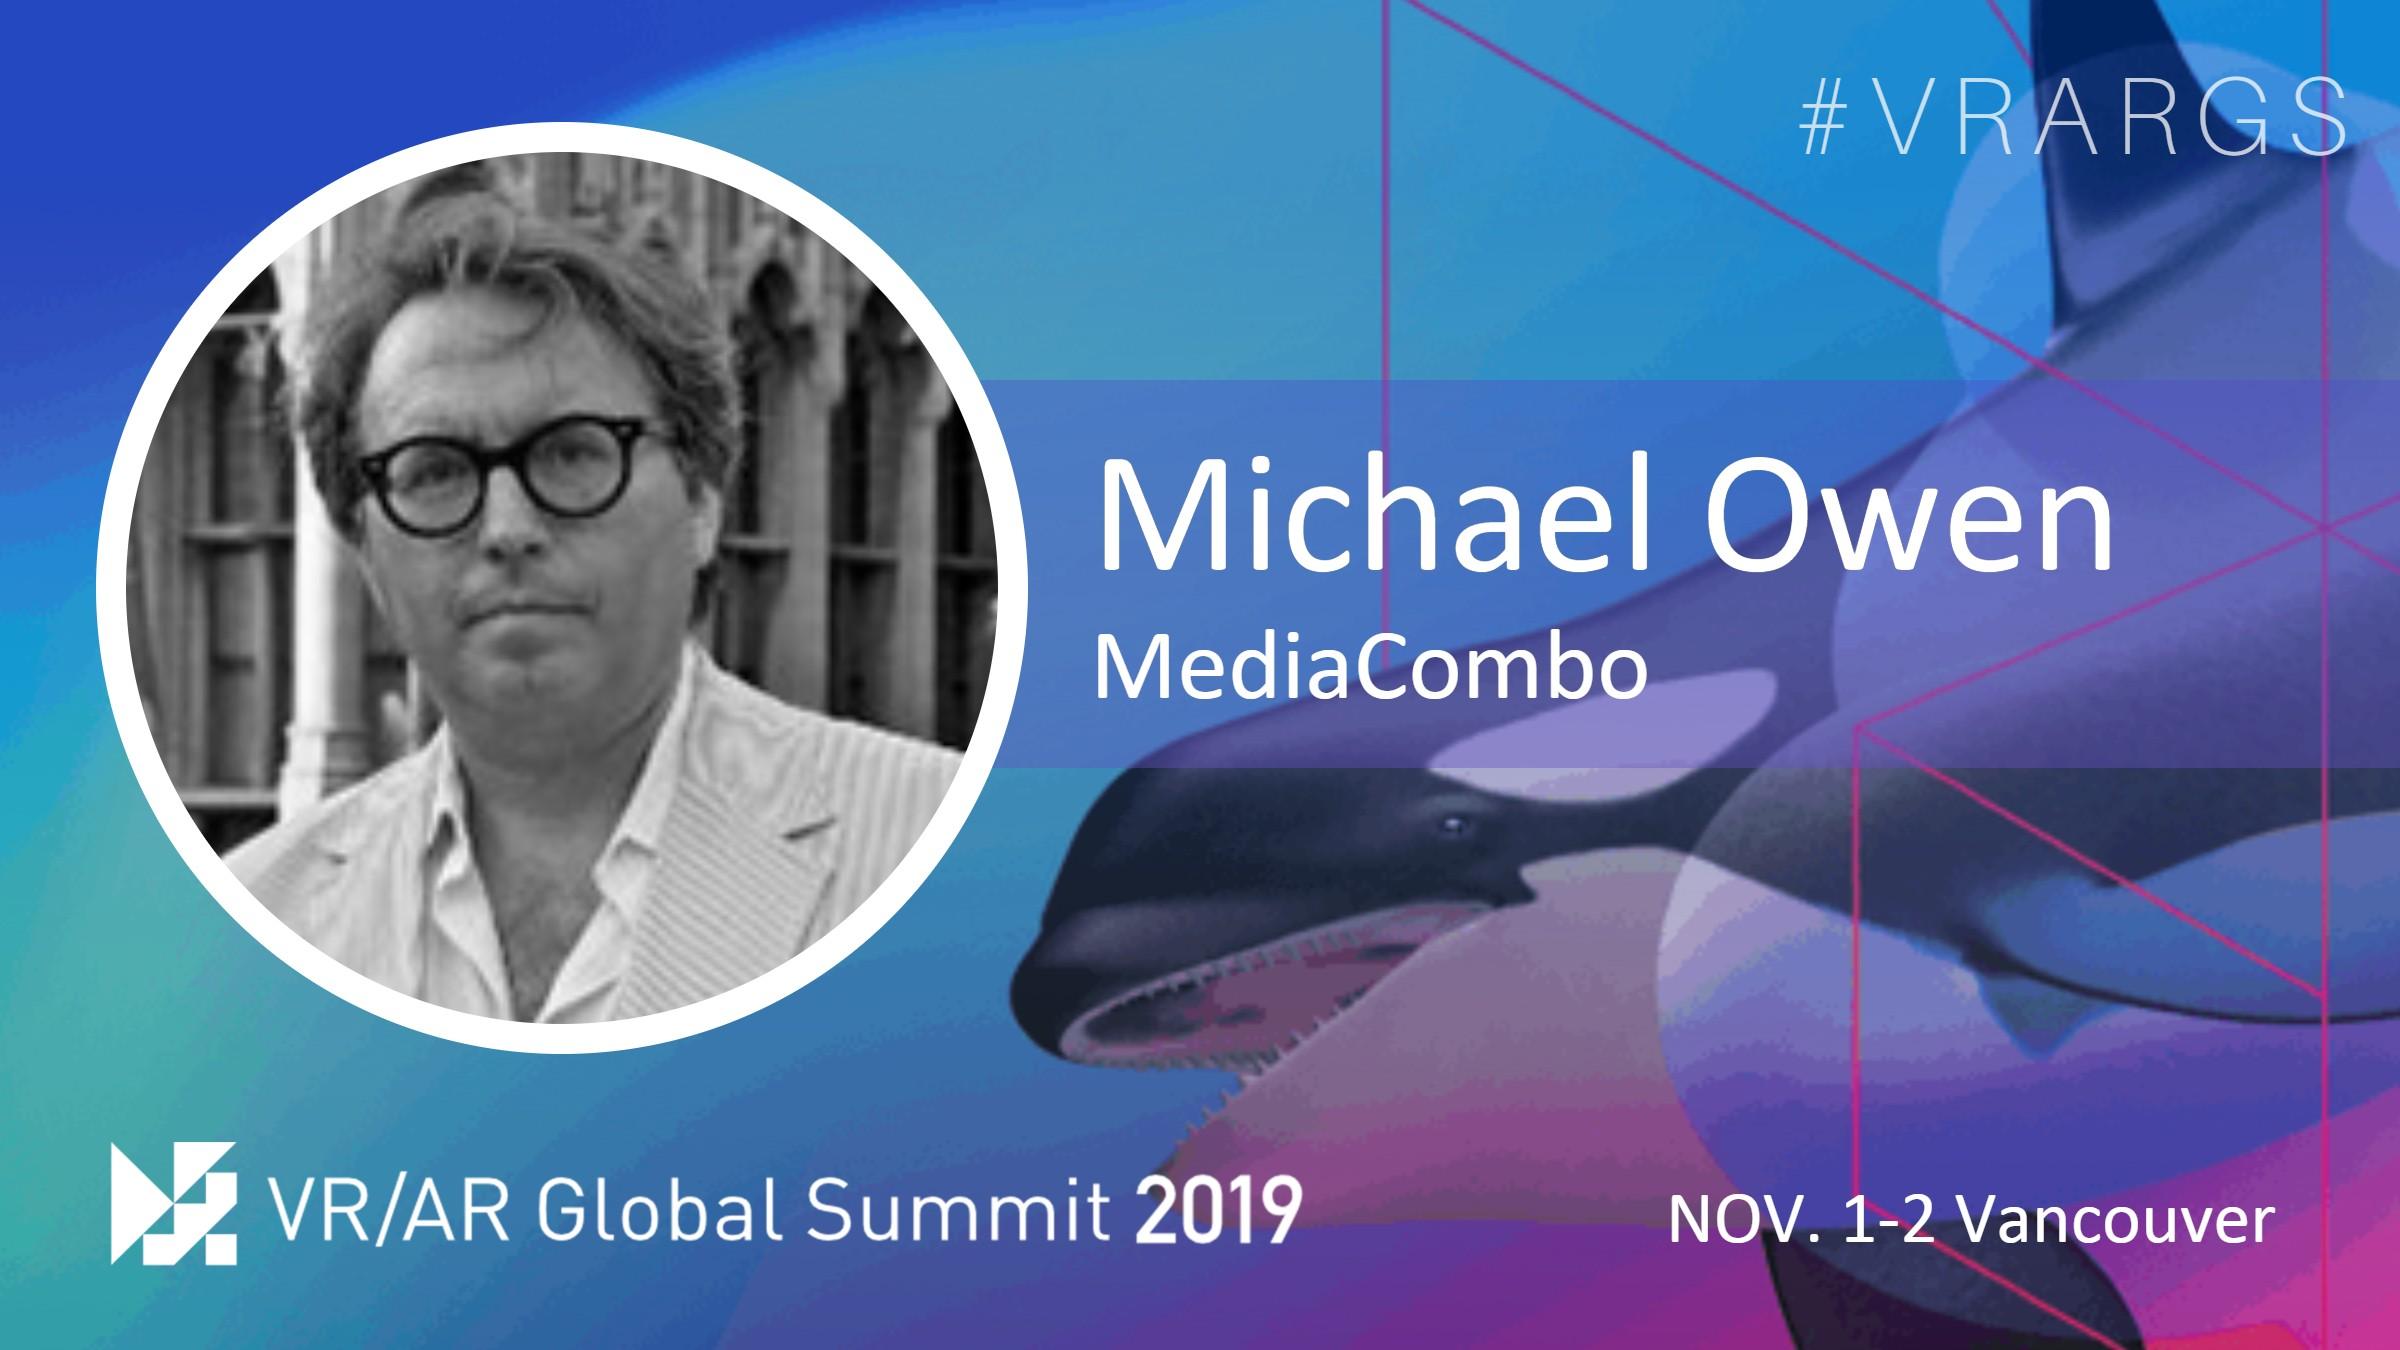 HighRes-Michael-Owen-Media-Combo-VRARGS-VRAR-Global-Summit-Spatial-Computing-Vancouver.jpg